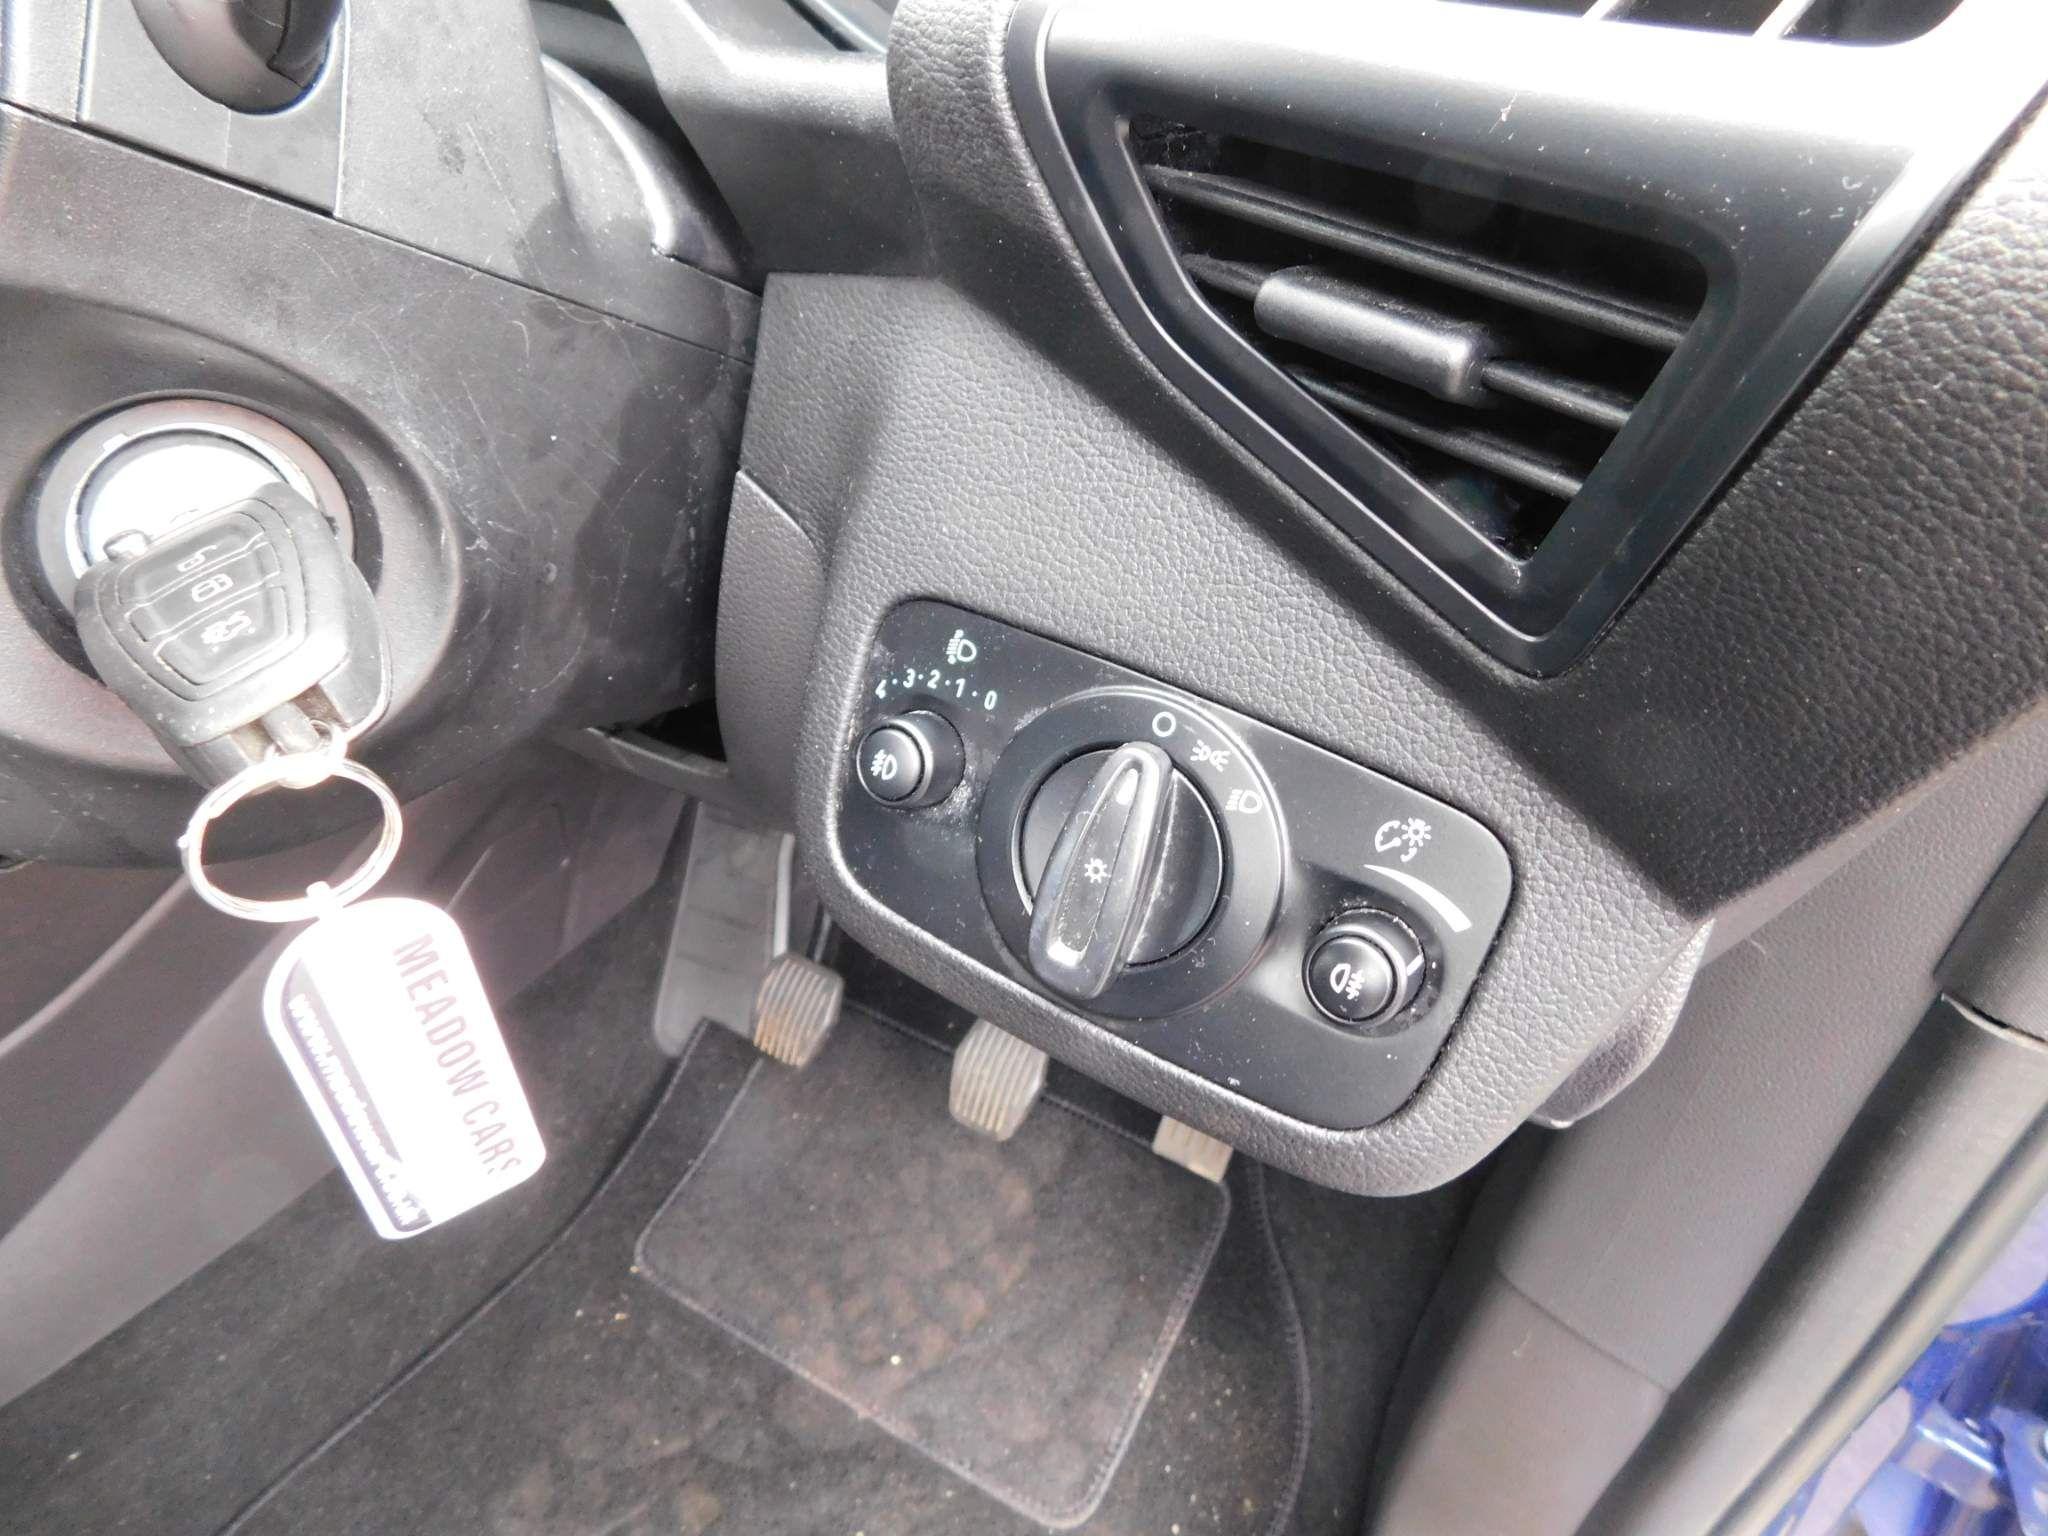 2018 FORD C-Max 1.0T EcoBoost Zetec (s/s) Petrol Manual due in – Meadow Cars Carrickfergus full